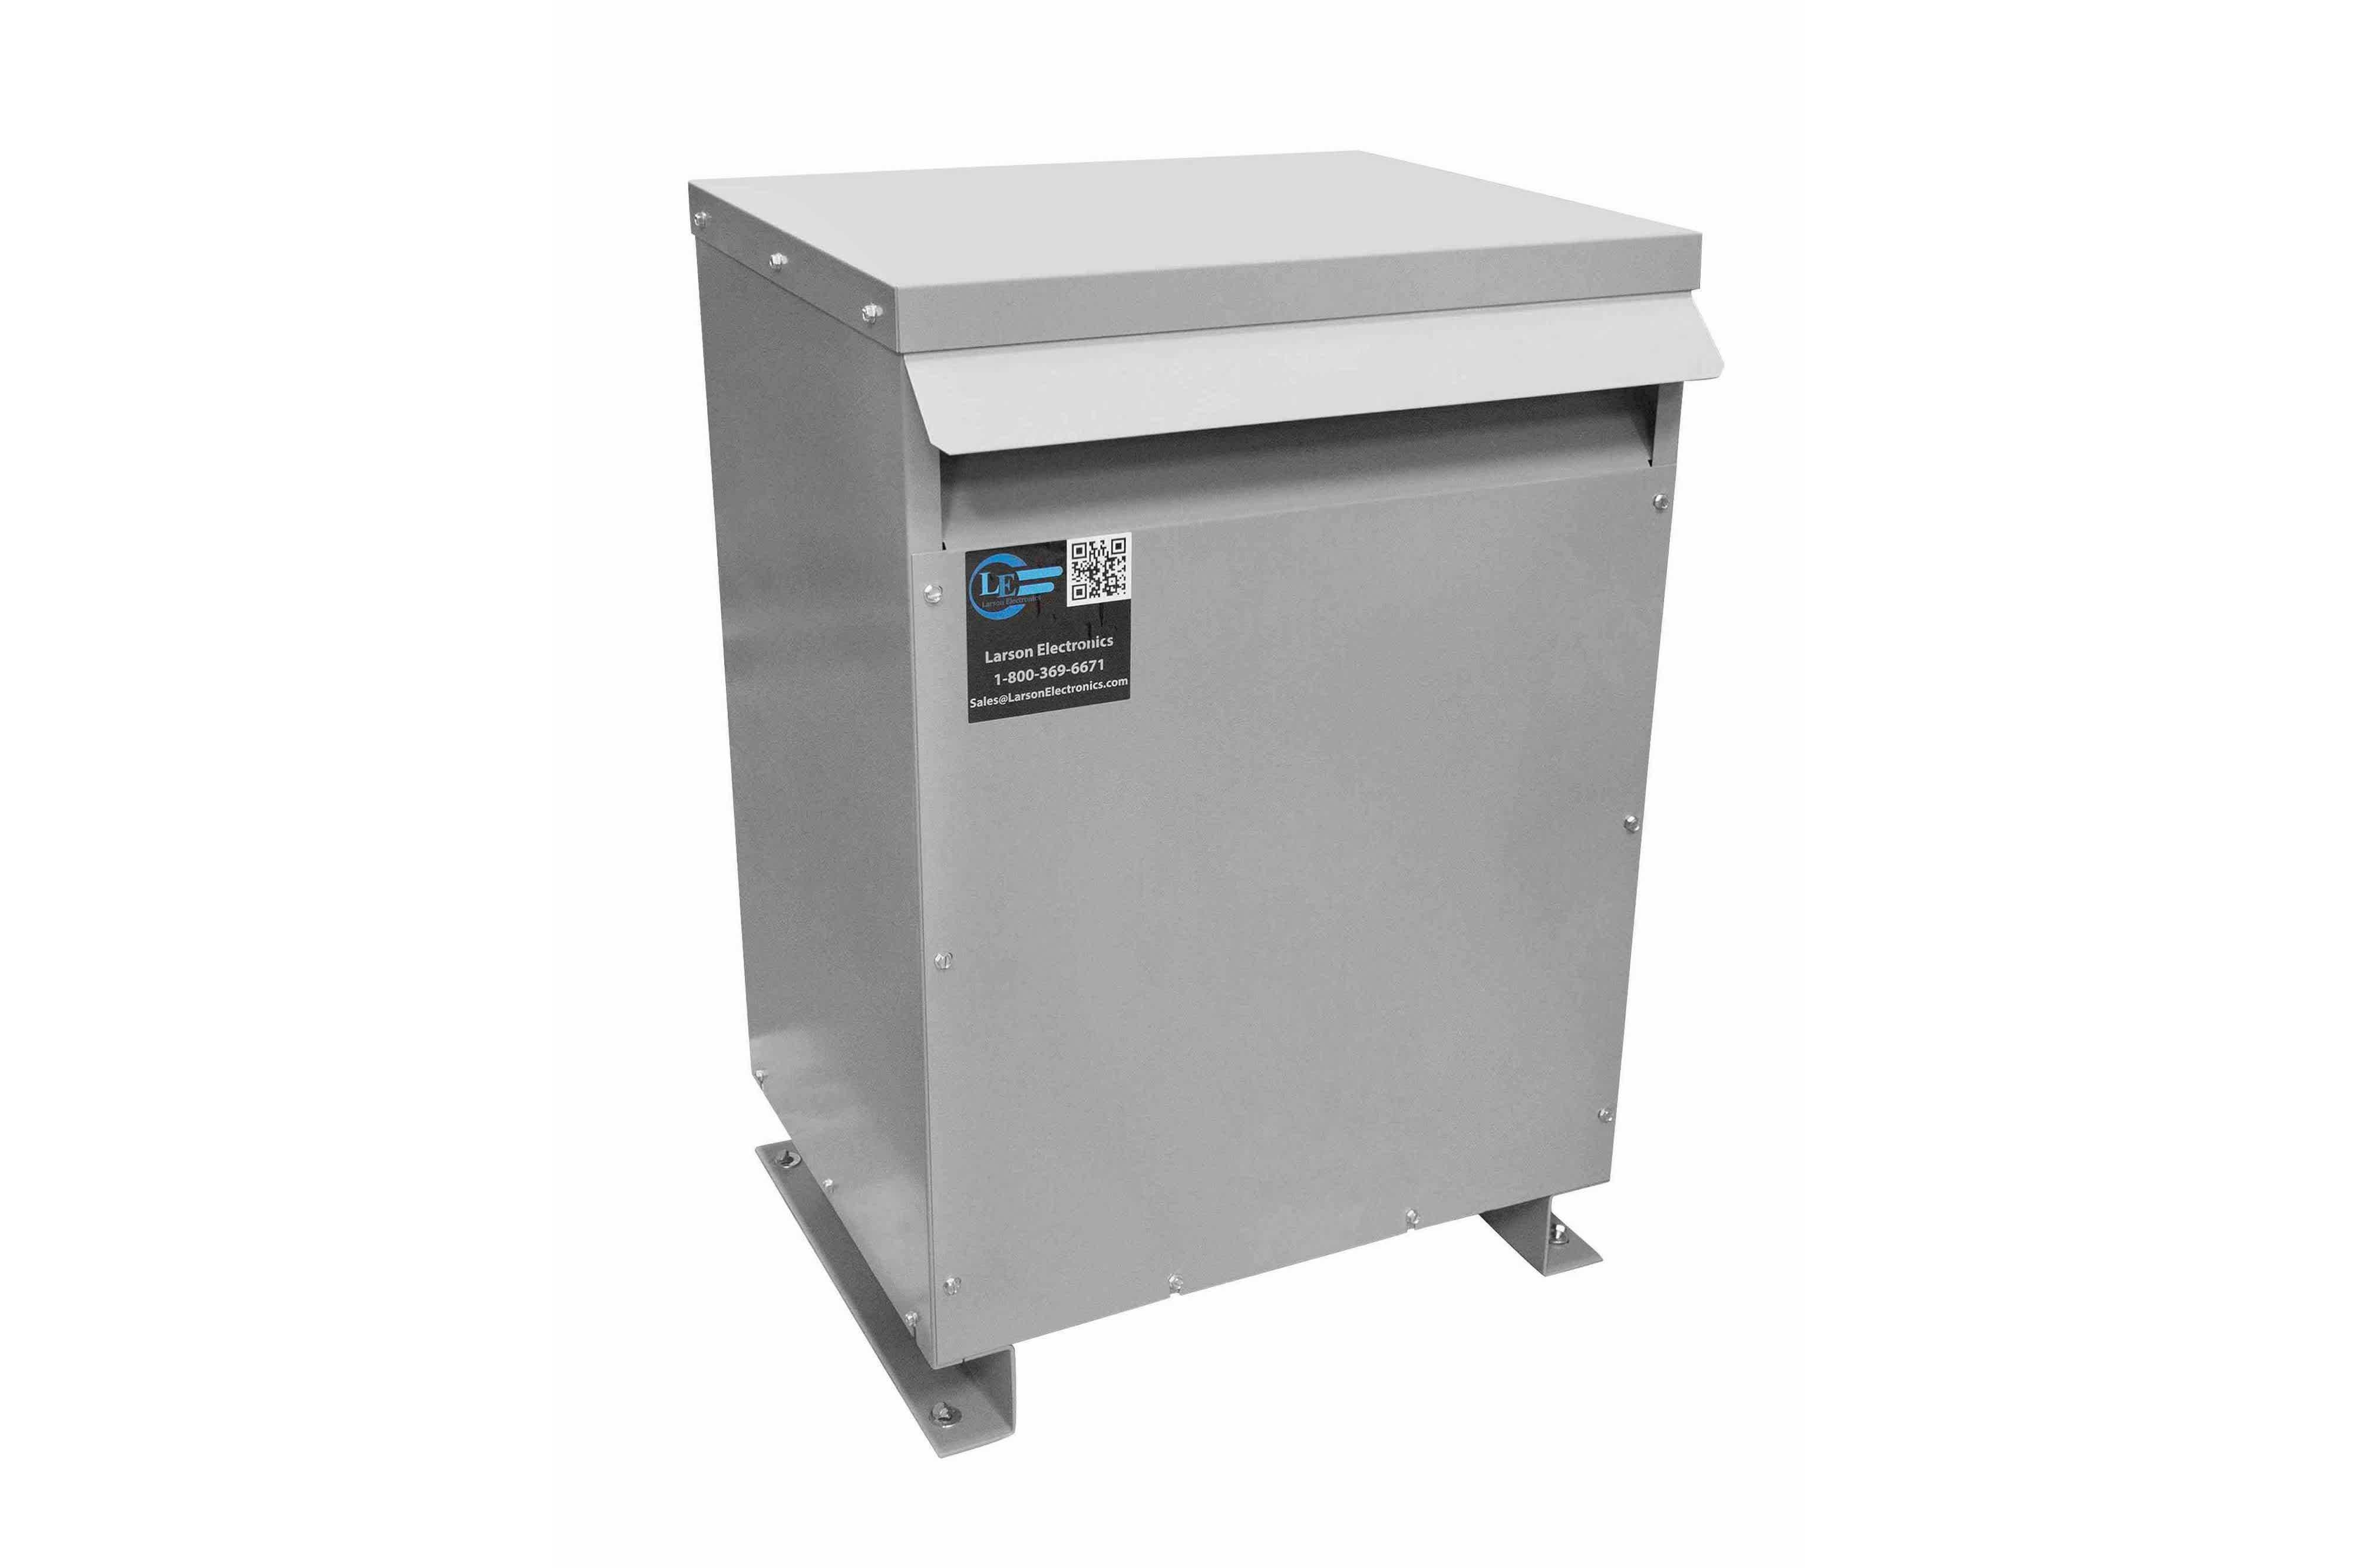 250 kVA 3PH Isolation Transformer, 380V Wye Primary, 600V Delta Secondary, N3R, Ventilated, 60 Hz